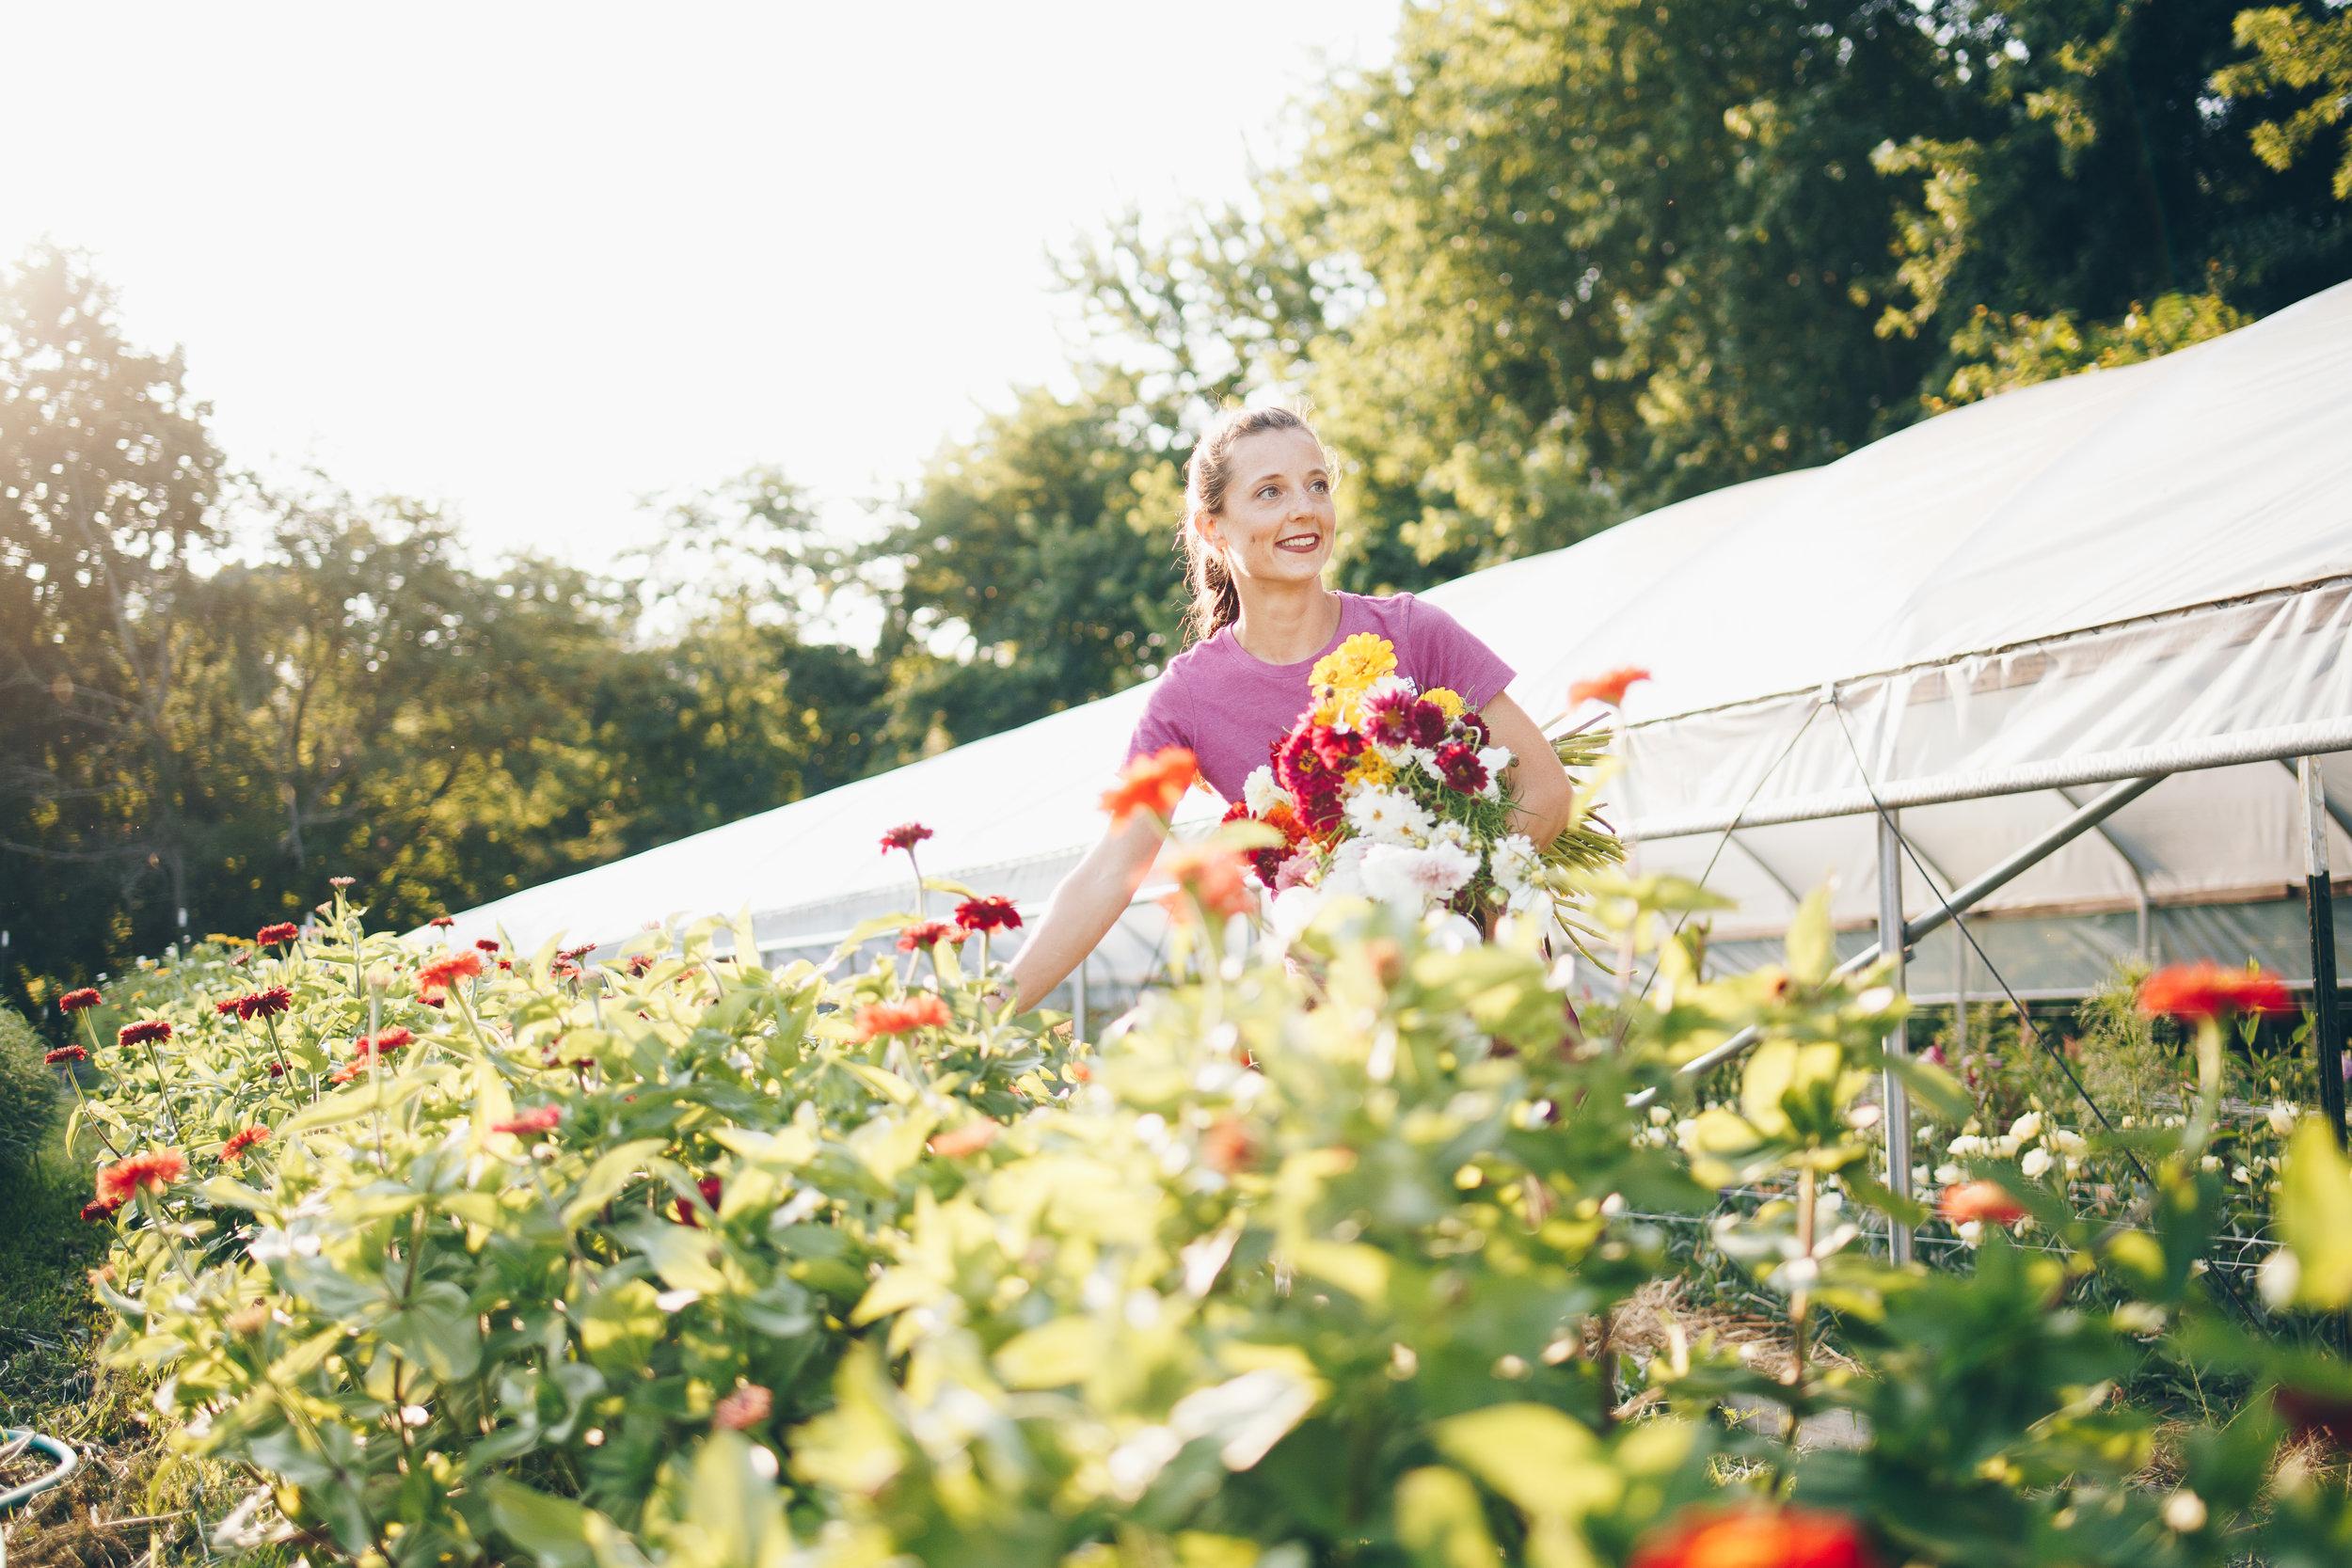 Harvesting Organic Specialty Cut Flowers